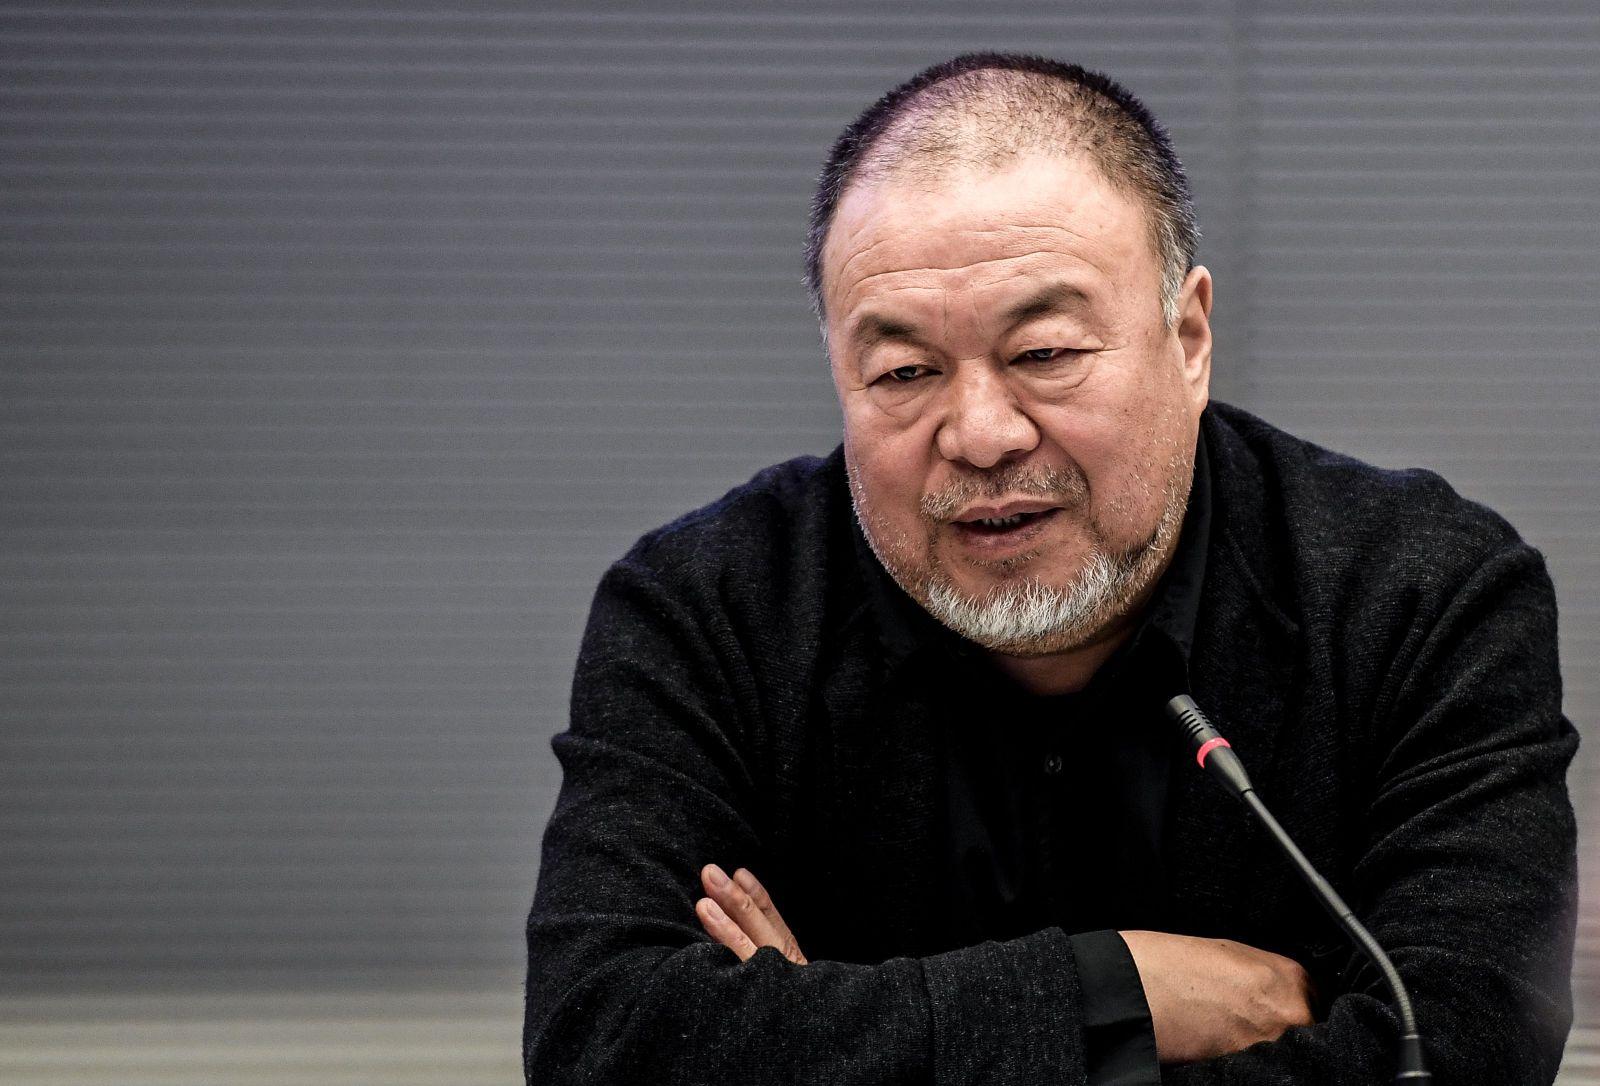 Ai Weiwei presents Wuhan documentary in Berlin, Germany - 29 Sep 2020